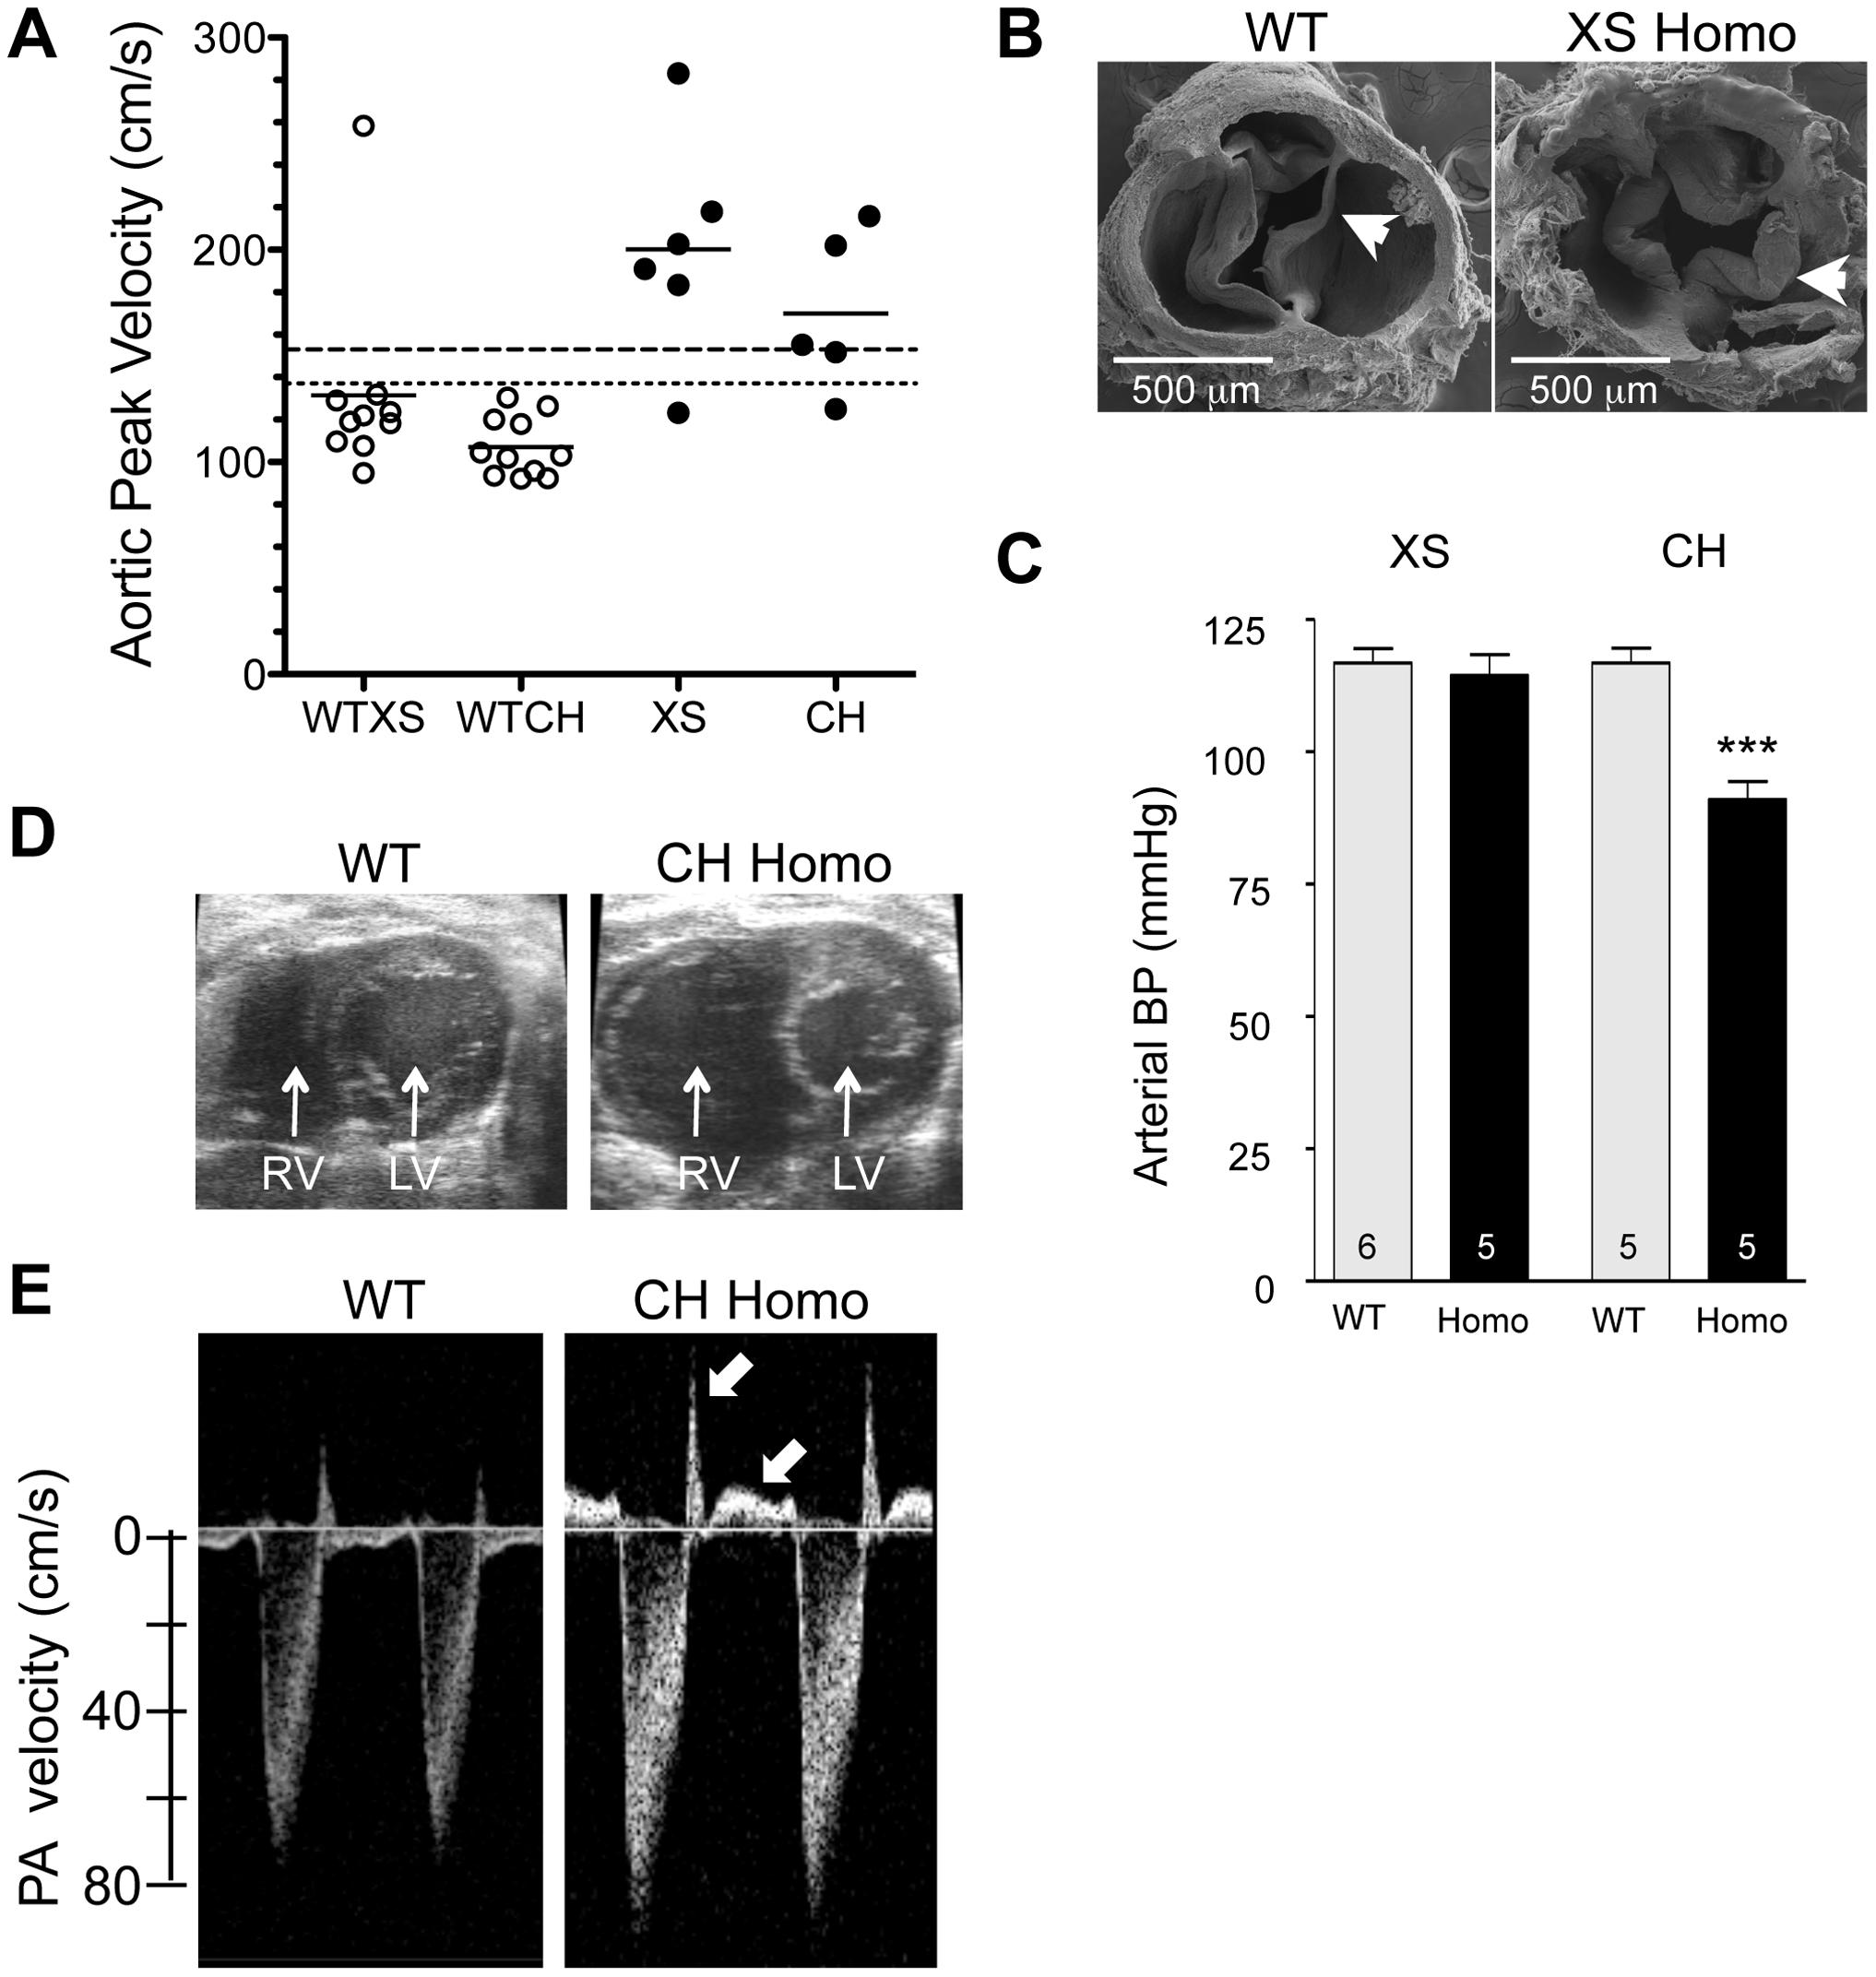 Cardiovascular changes in adult homozygous (homo) gene deletion mutants.